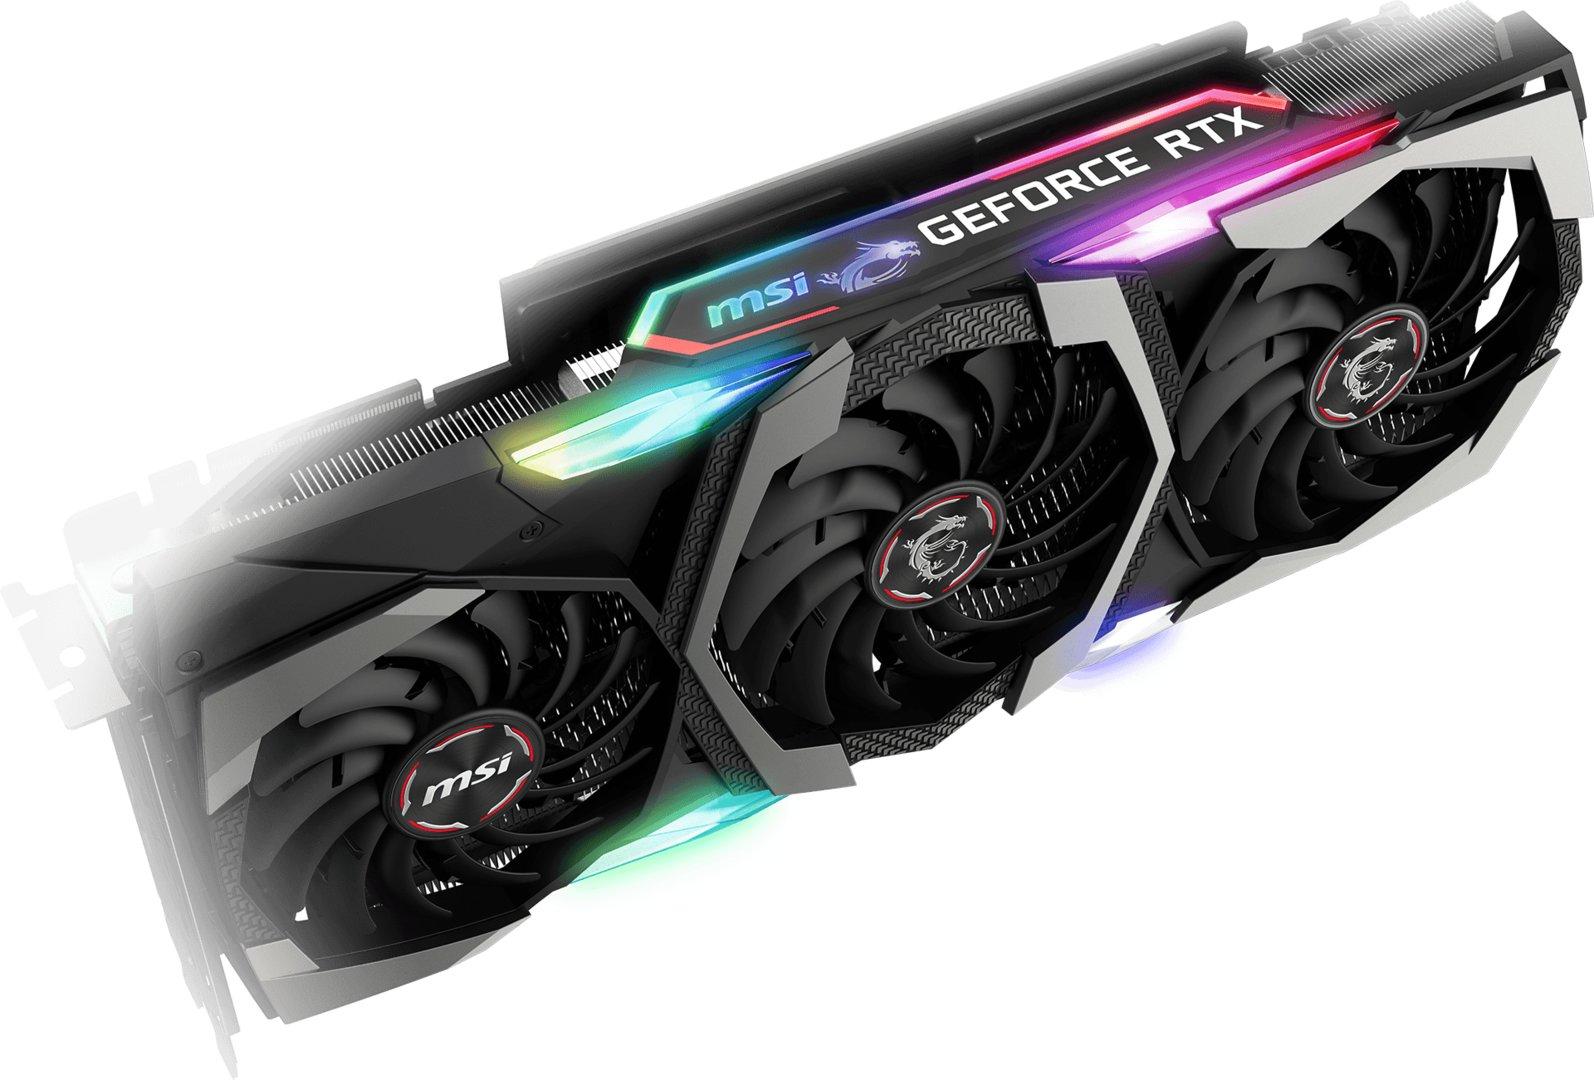 Die RGB-LED-Beleuchtung der MSI Gaming X Trio